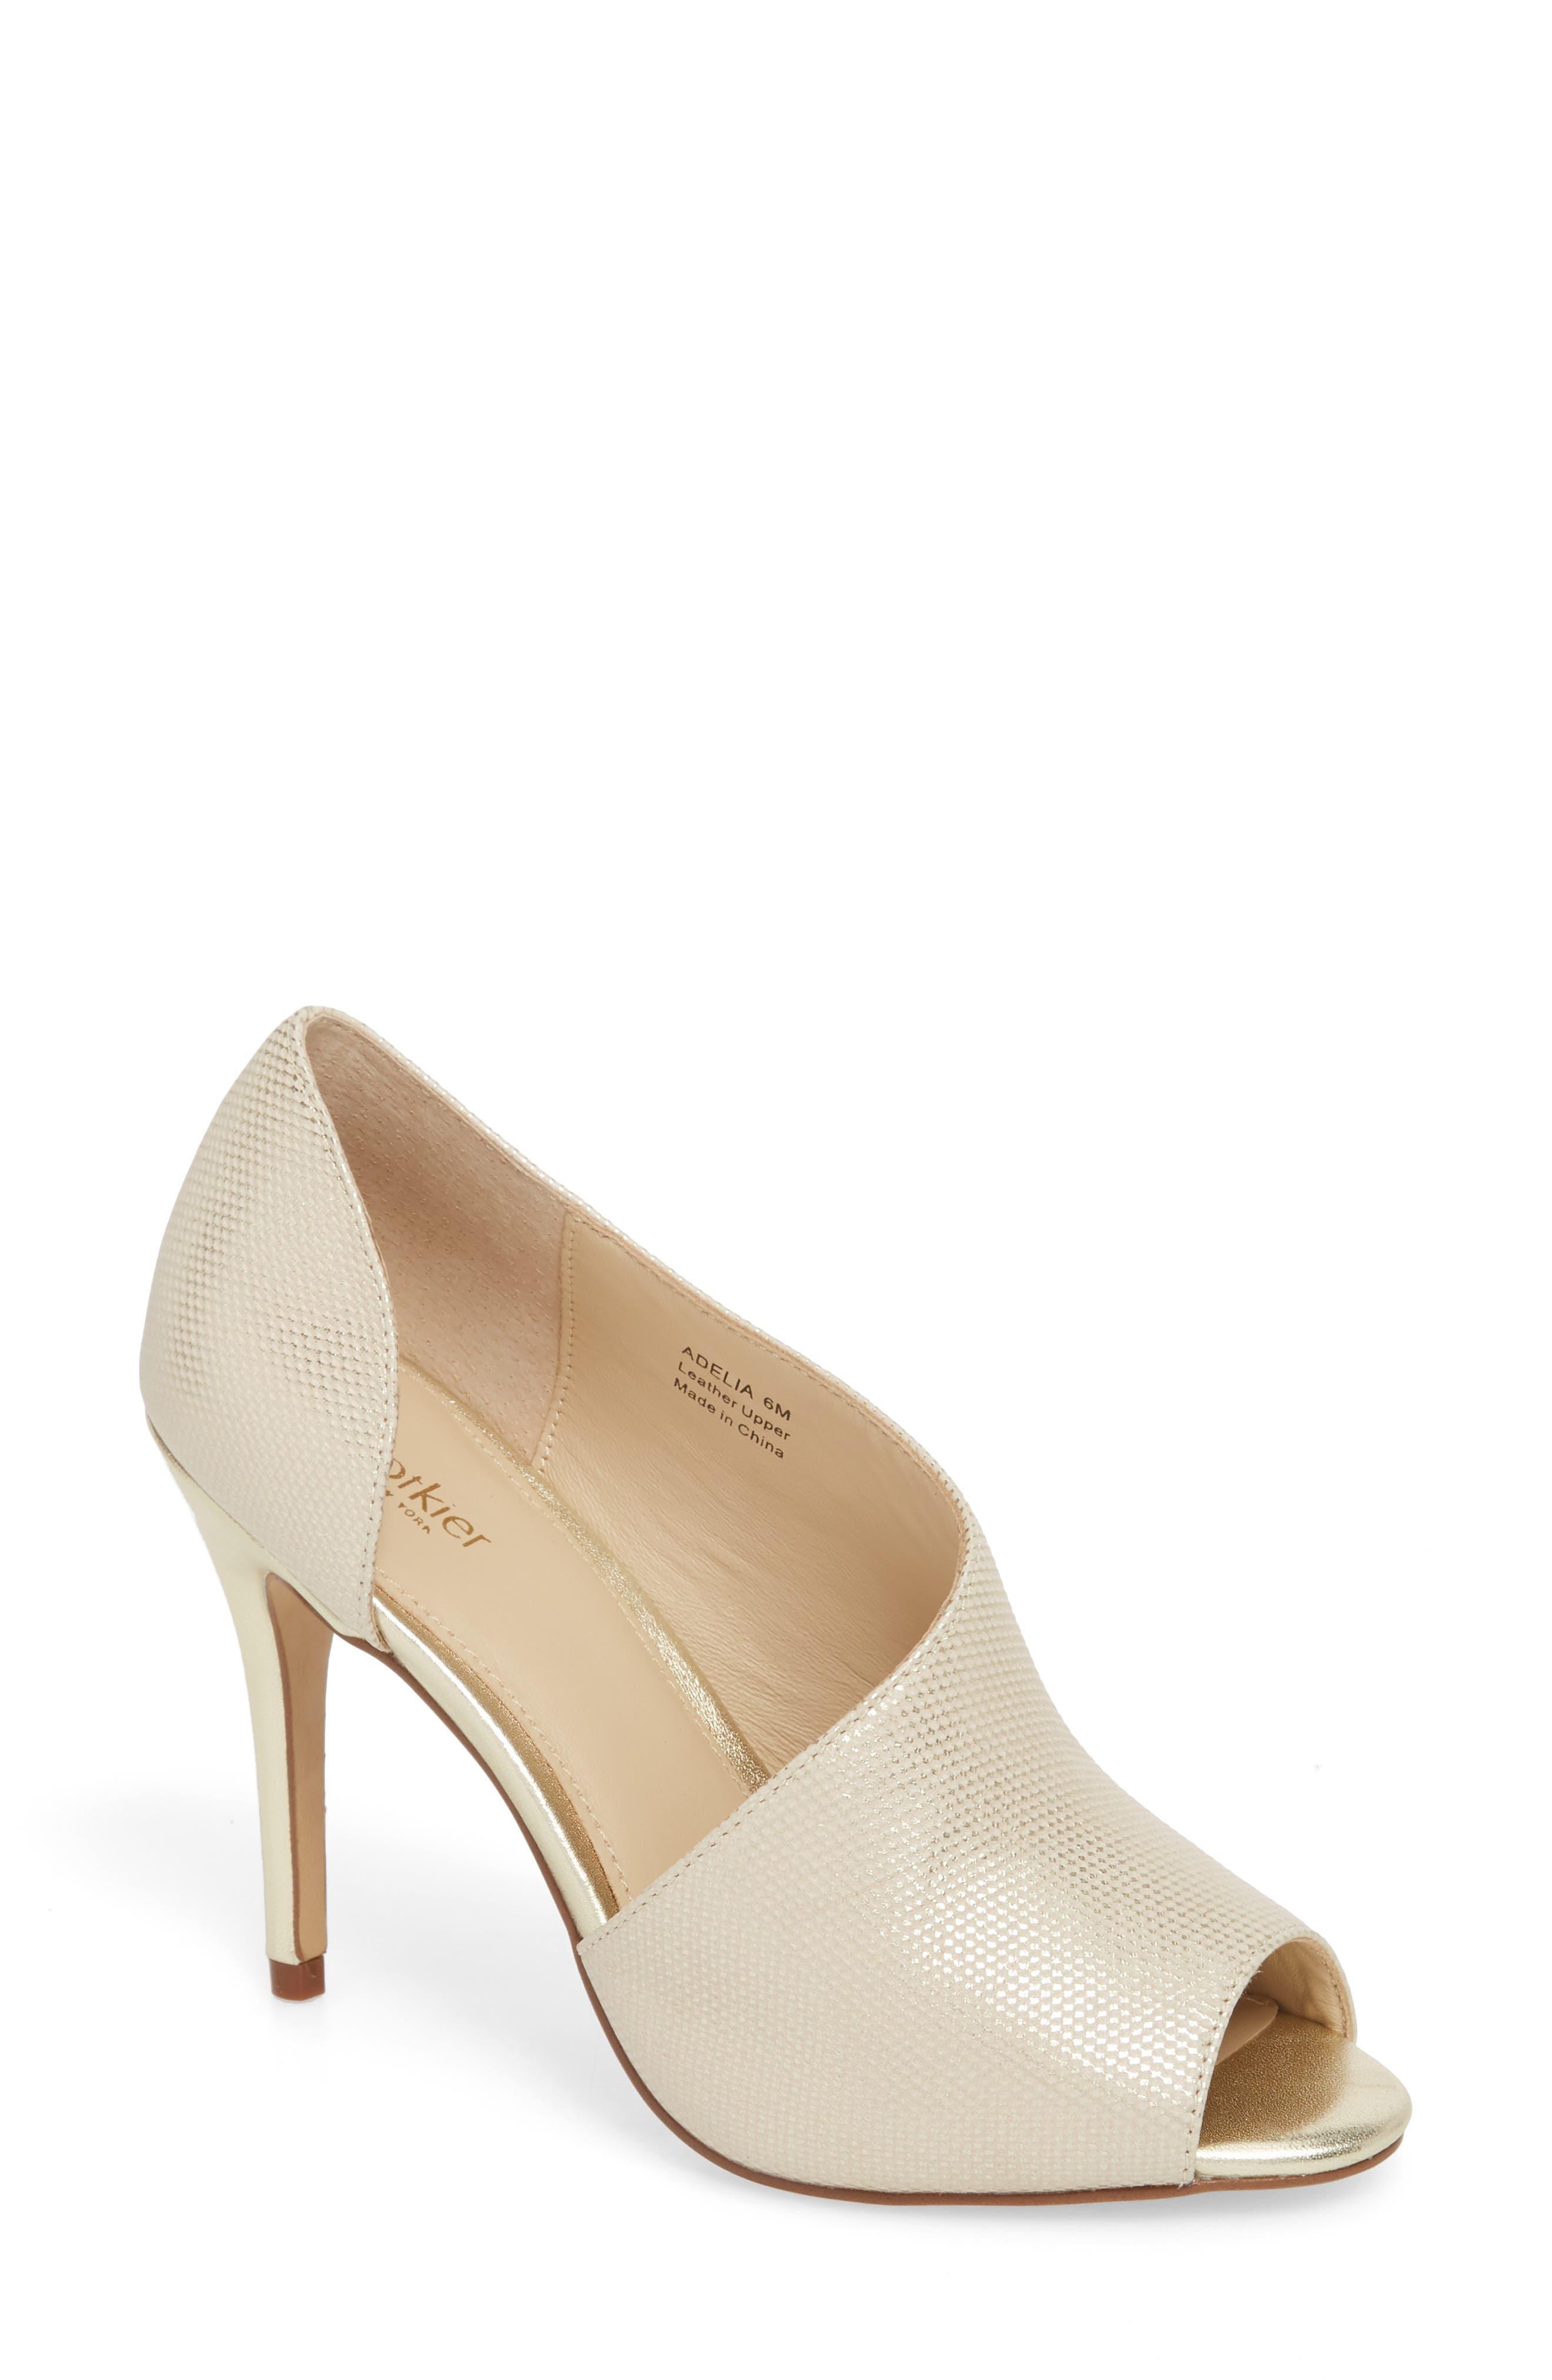 Adelia Asymmetrical Sandal,                         Main,                         color, Gold Shimmer Fabric